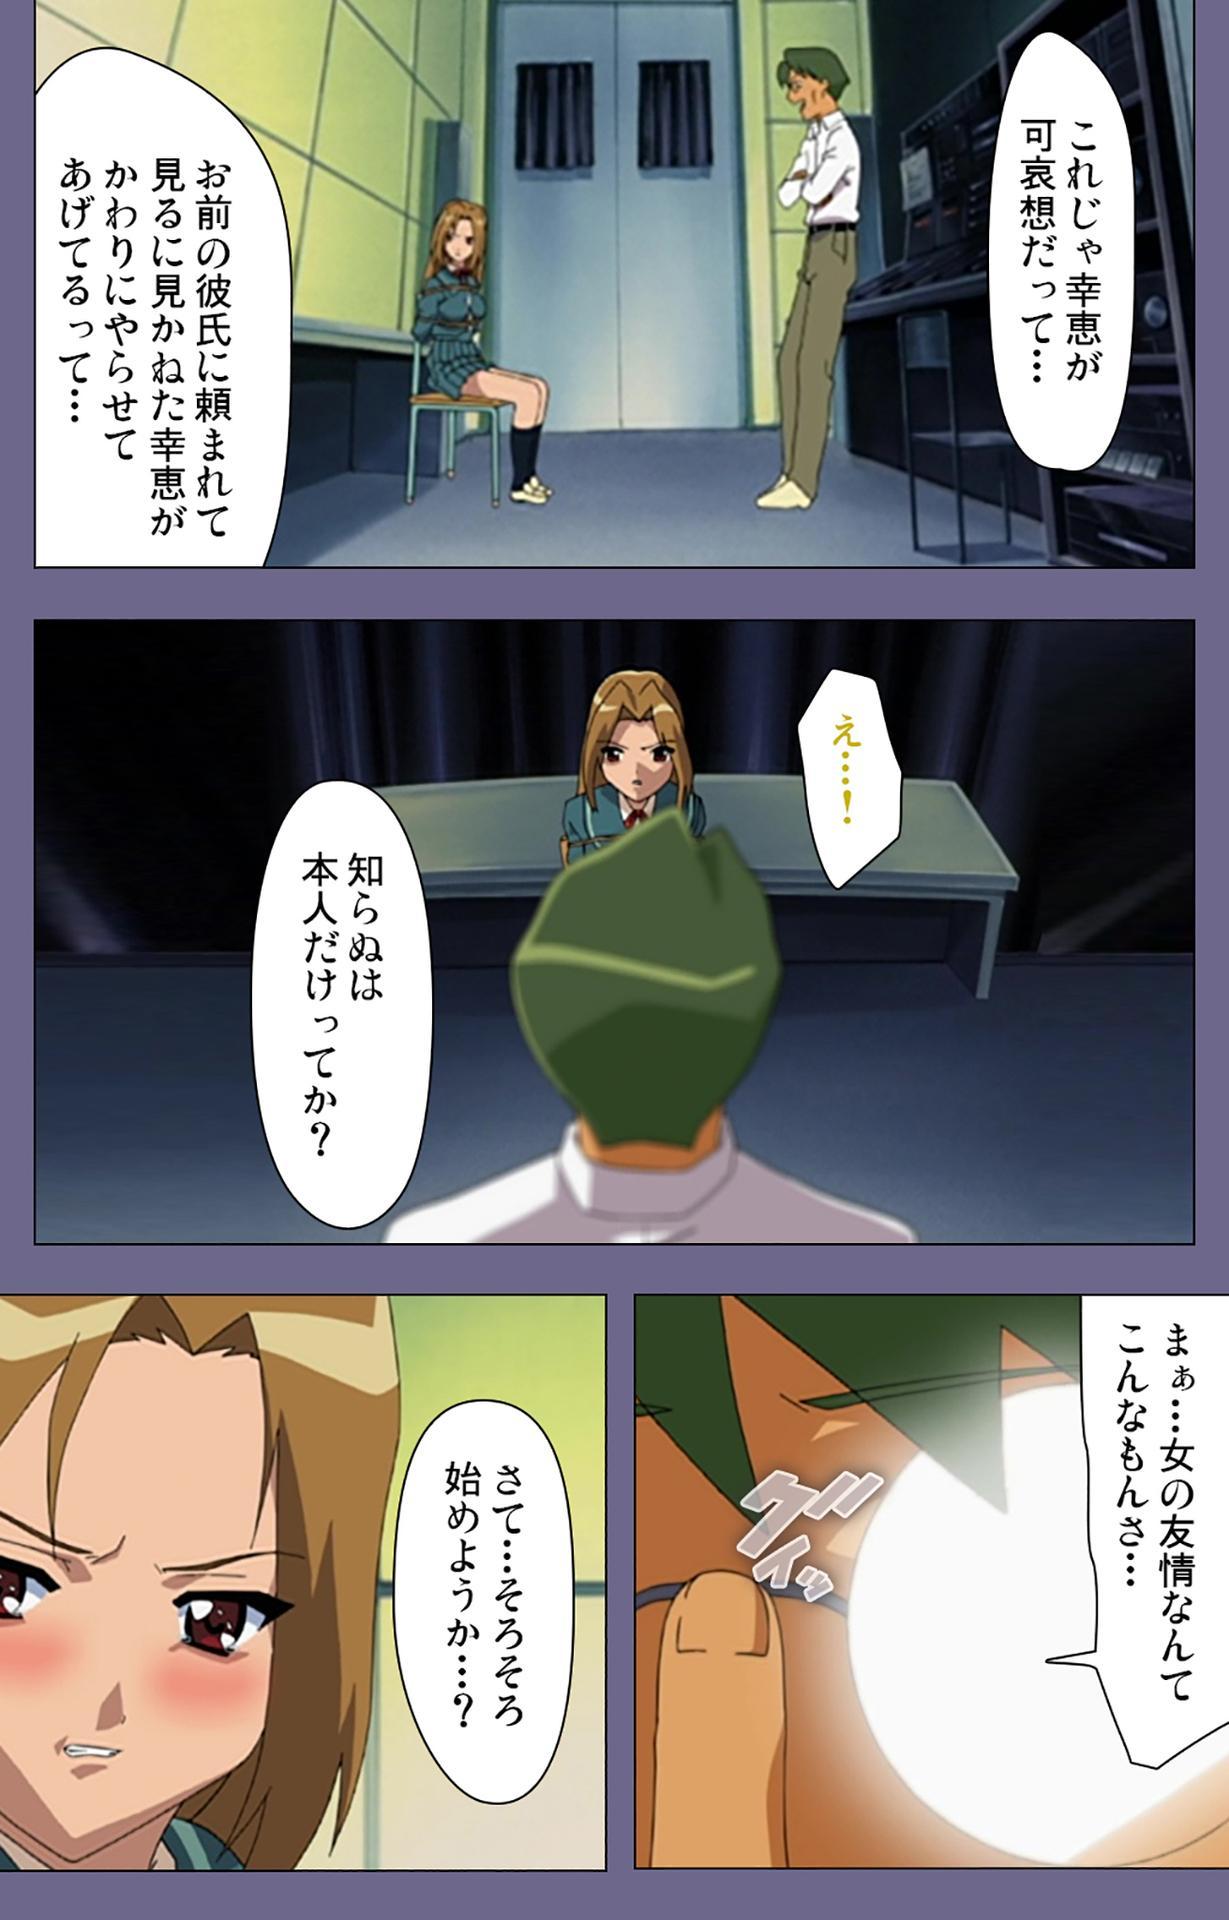 Korashime Kanzenban 166